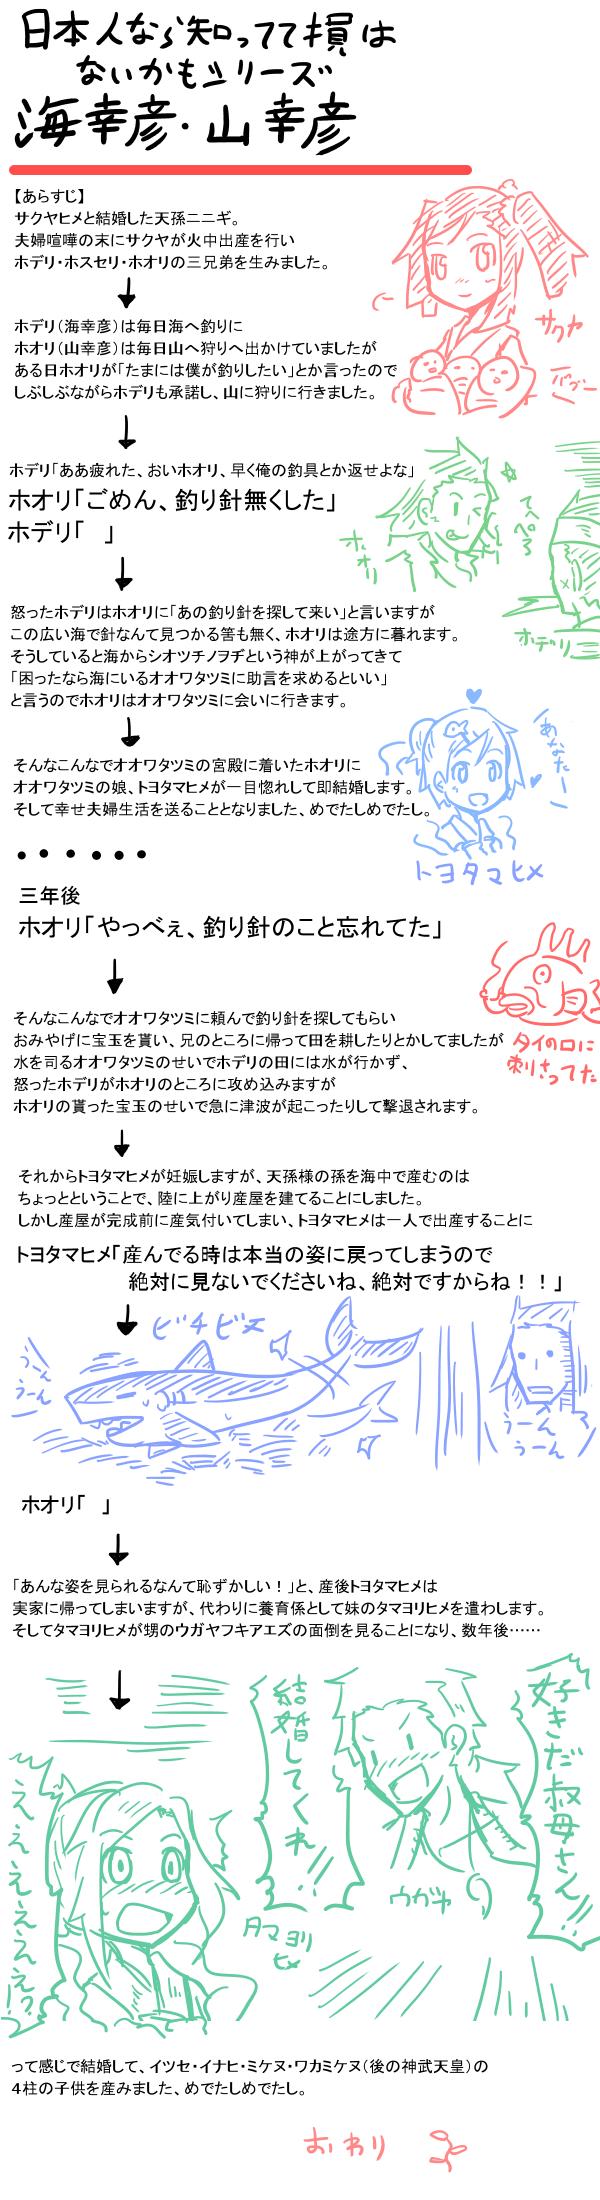 20131225083251_239_1